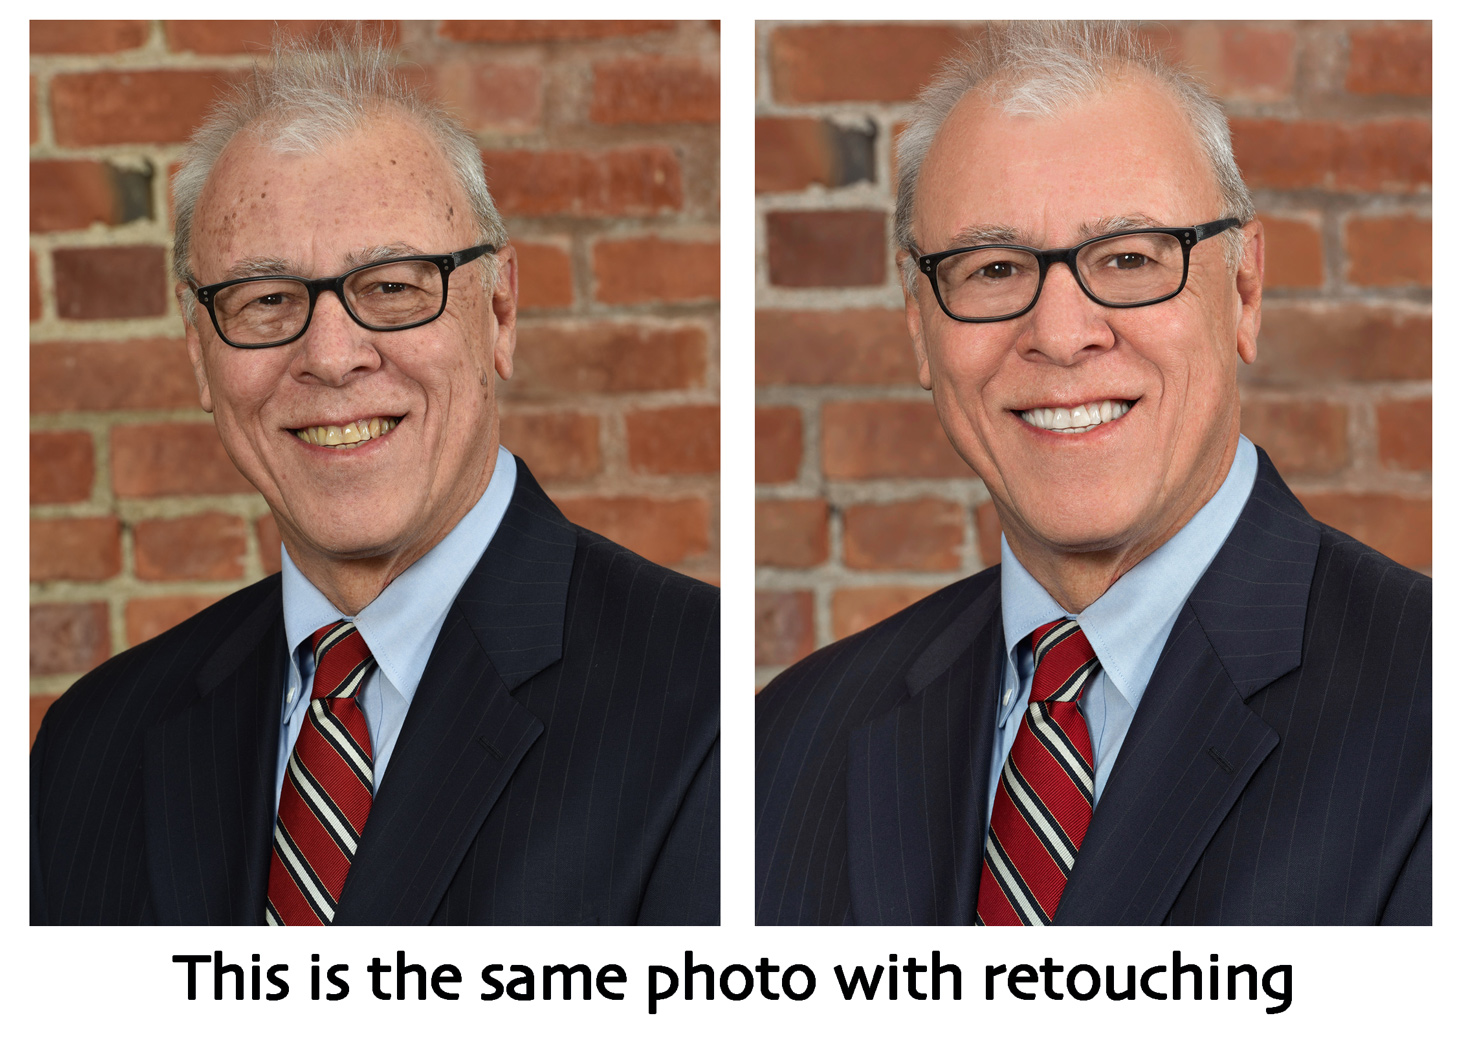 business headshot portraits with retouching